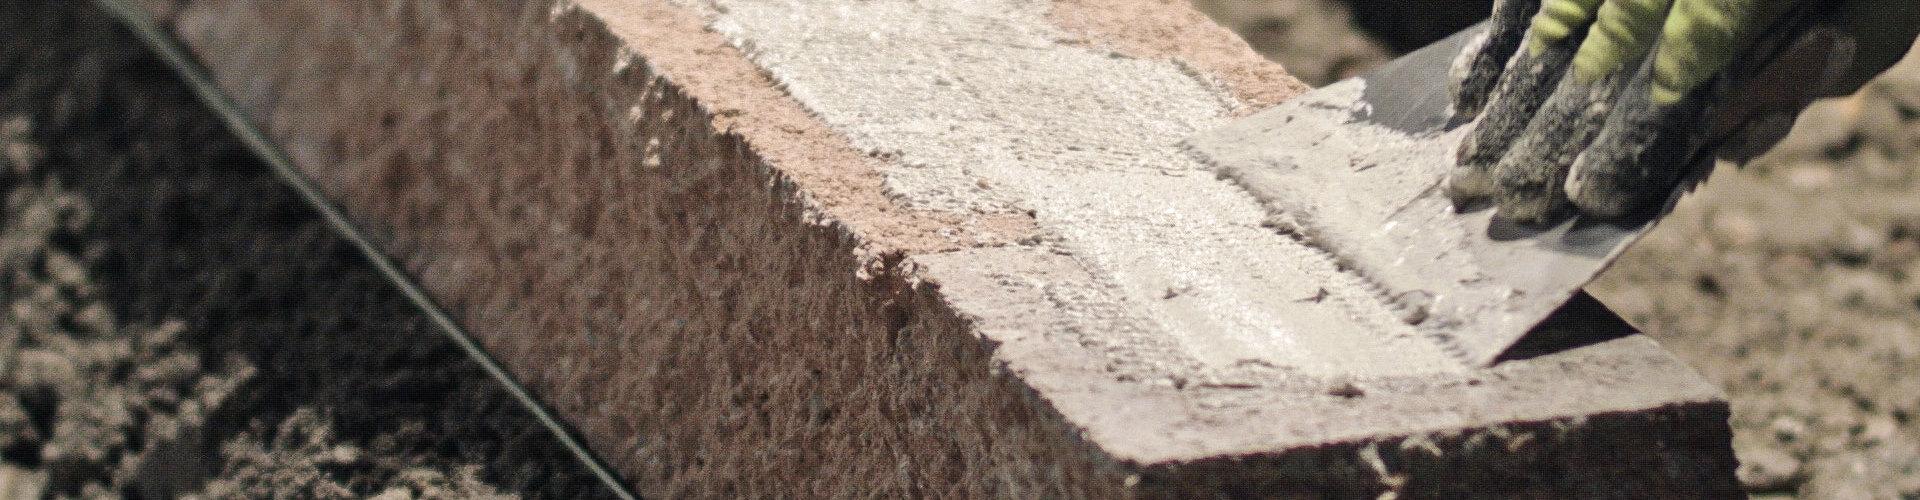 Gartenmauer bauen Schritt für Schritt